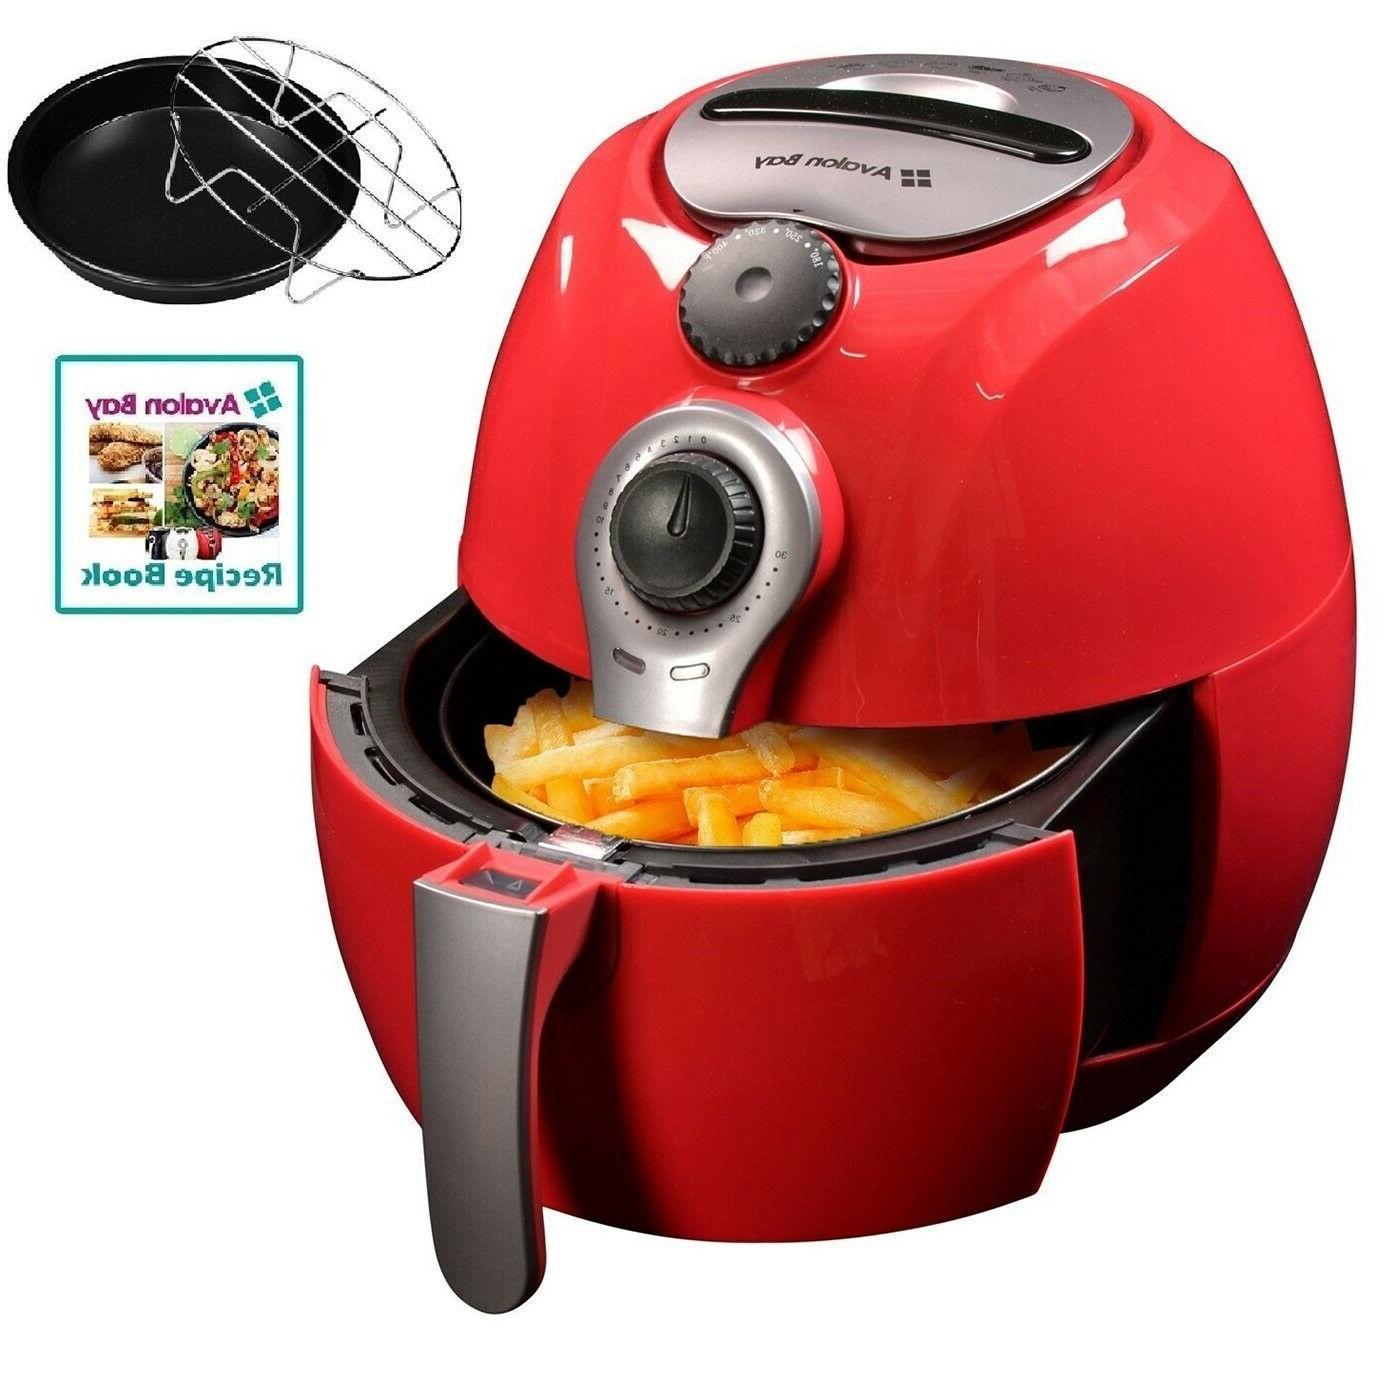 Multipurpose Air Fryer Baking Frying Cooking